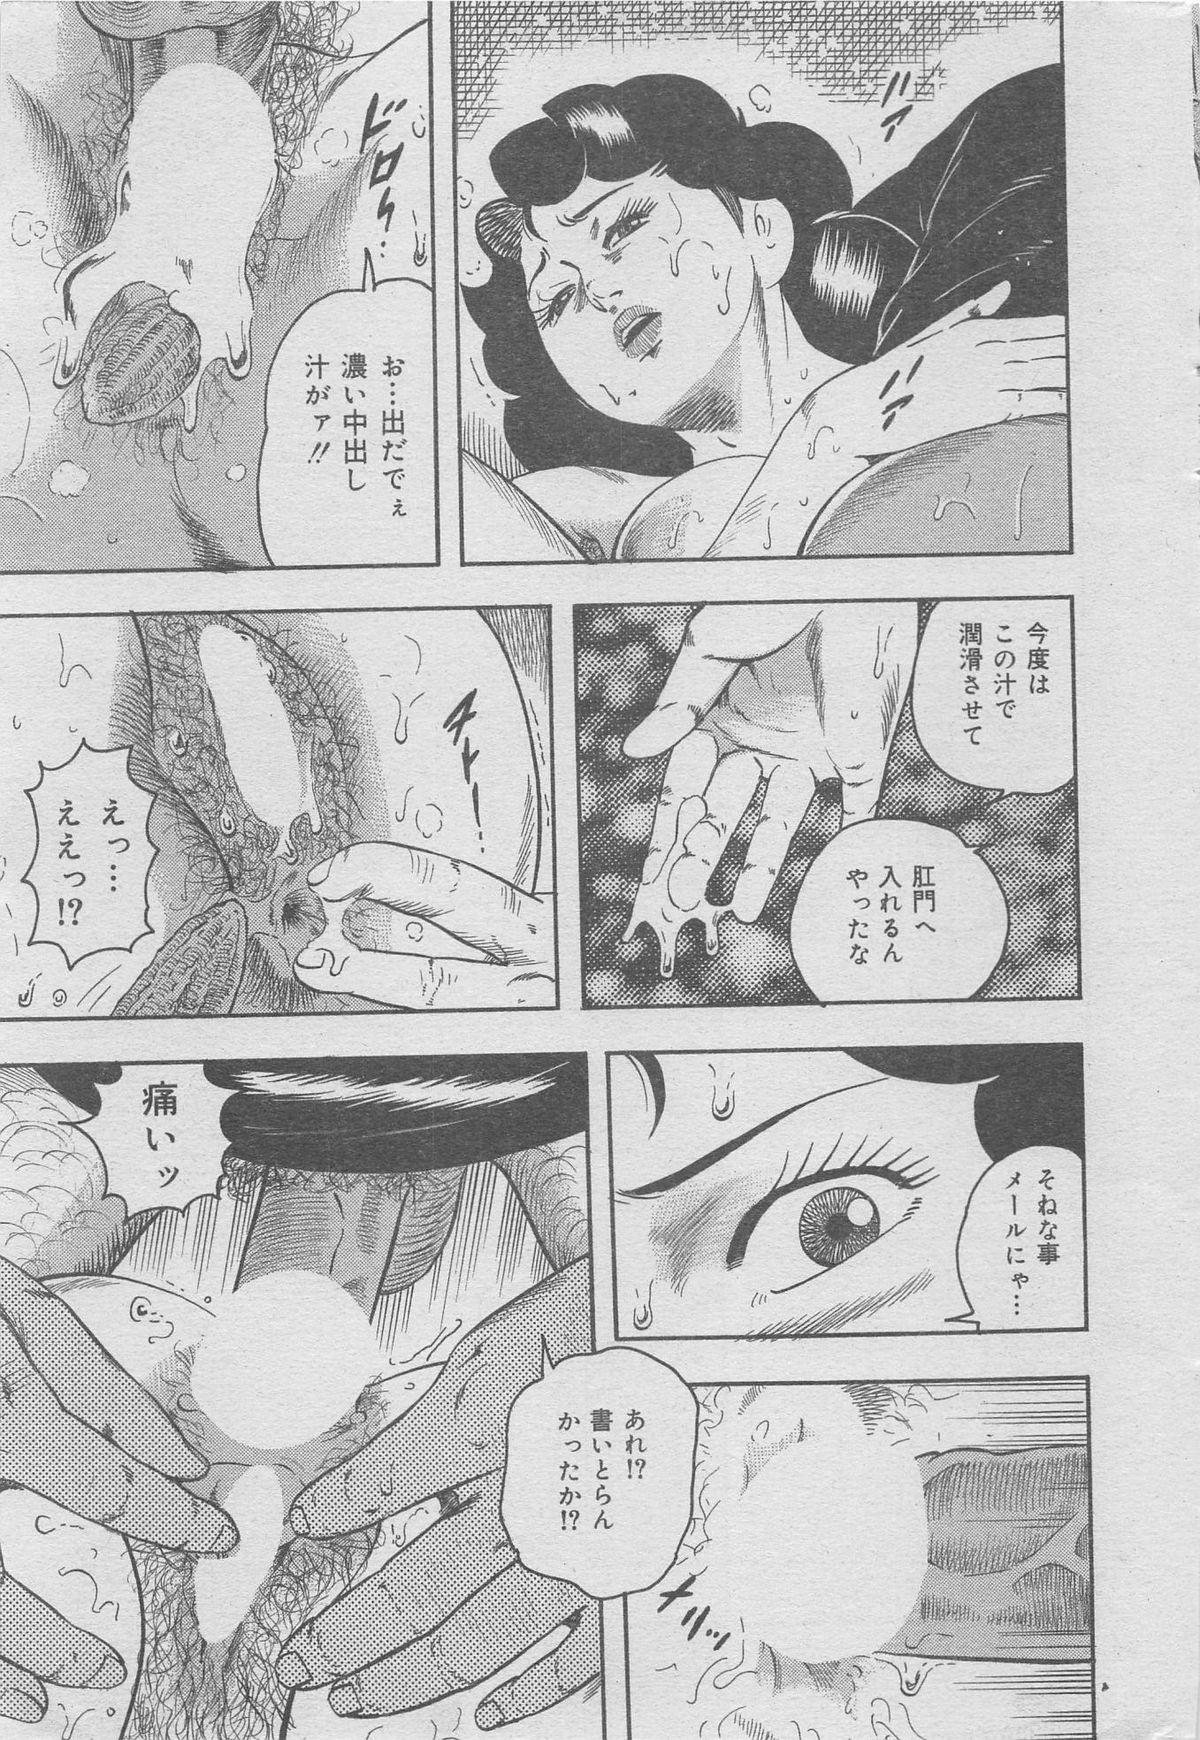 Hontou ni Atta Kindanai vol.7 16